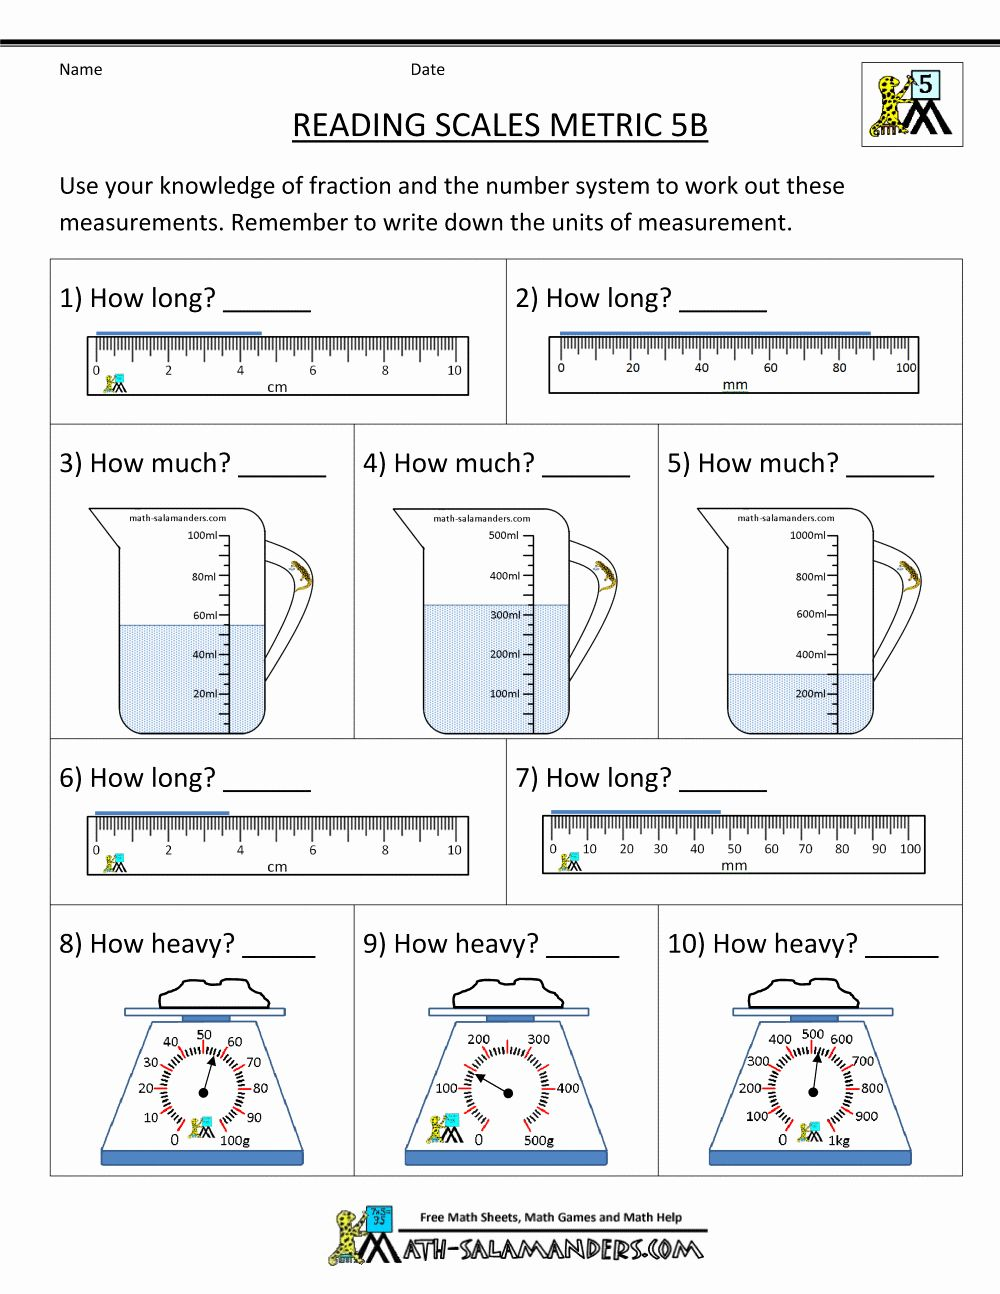 Measuring Liquid Volume Worksheet Awesome Measurement Volume Graphing Worksheets Chessmu In 2020 Measurement Worksheets Math Division Worksheets Kids Math Worksheets